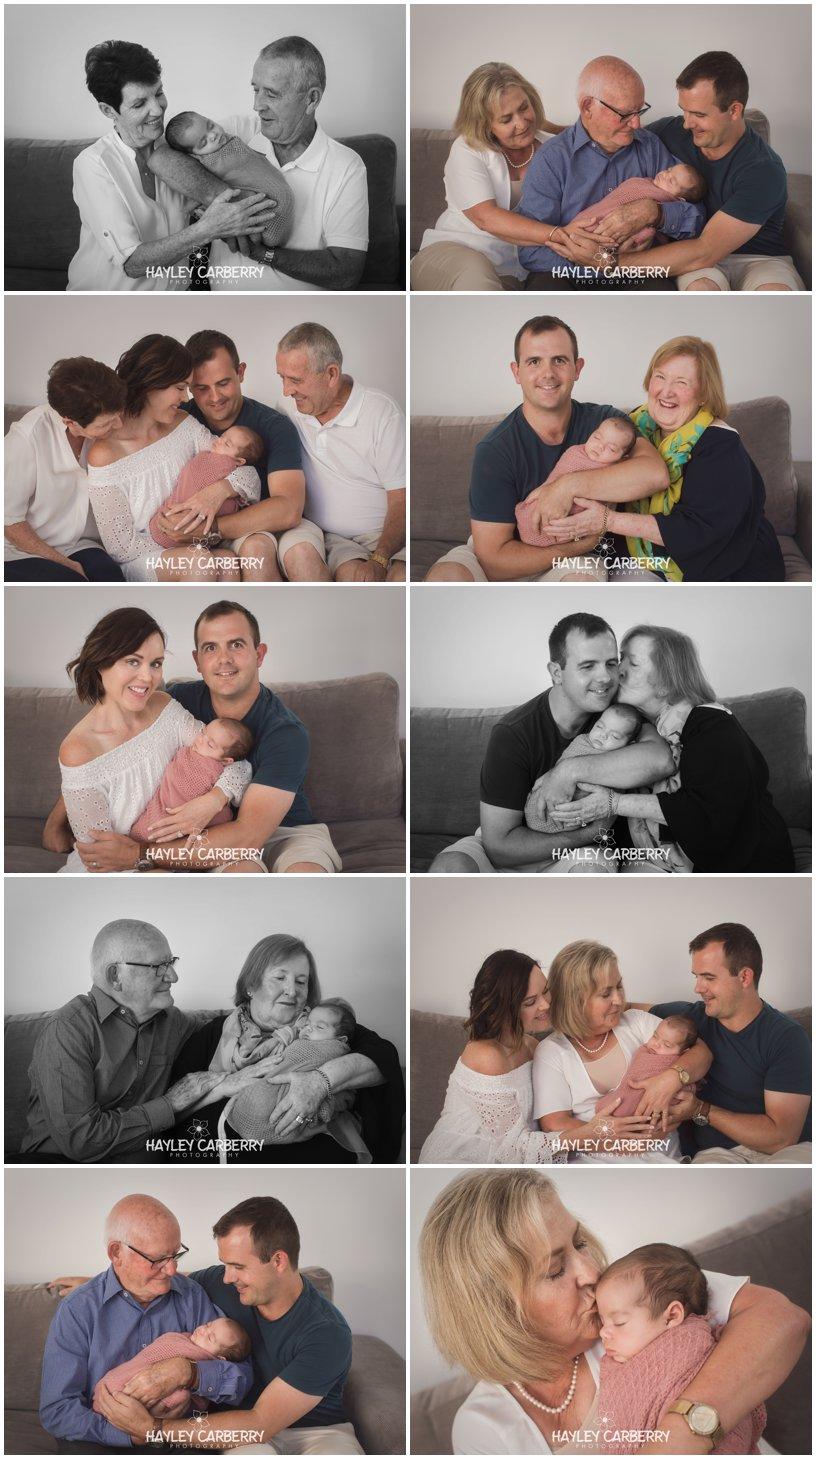 ChildrenBabiesFamilyNewbornCanberraPhotographer-4_WEB.jpg